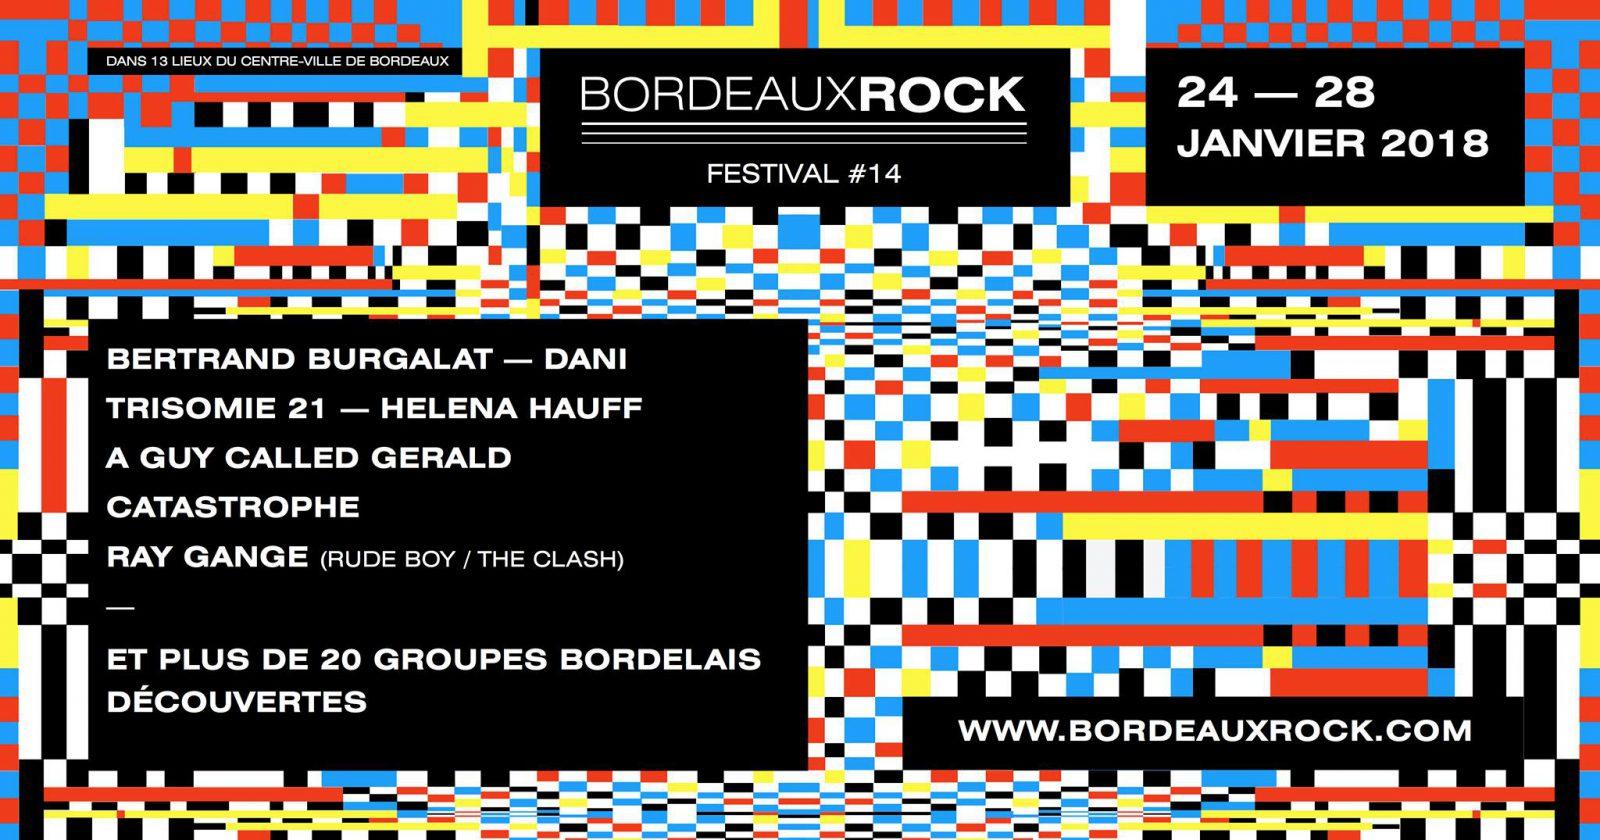 [Festival] Festival Bordeaux Rock #14